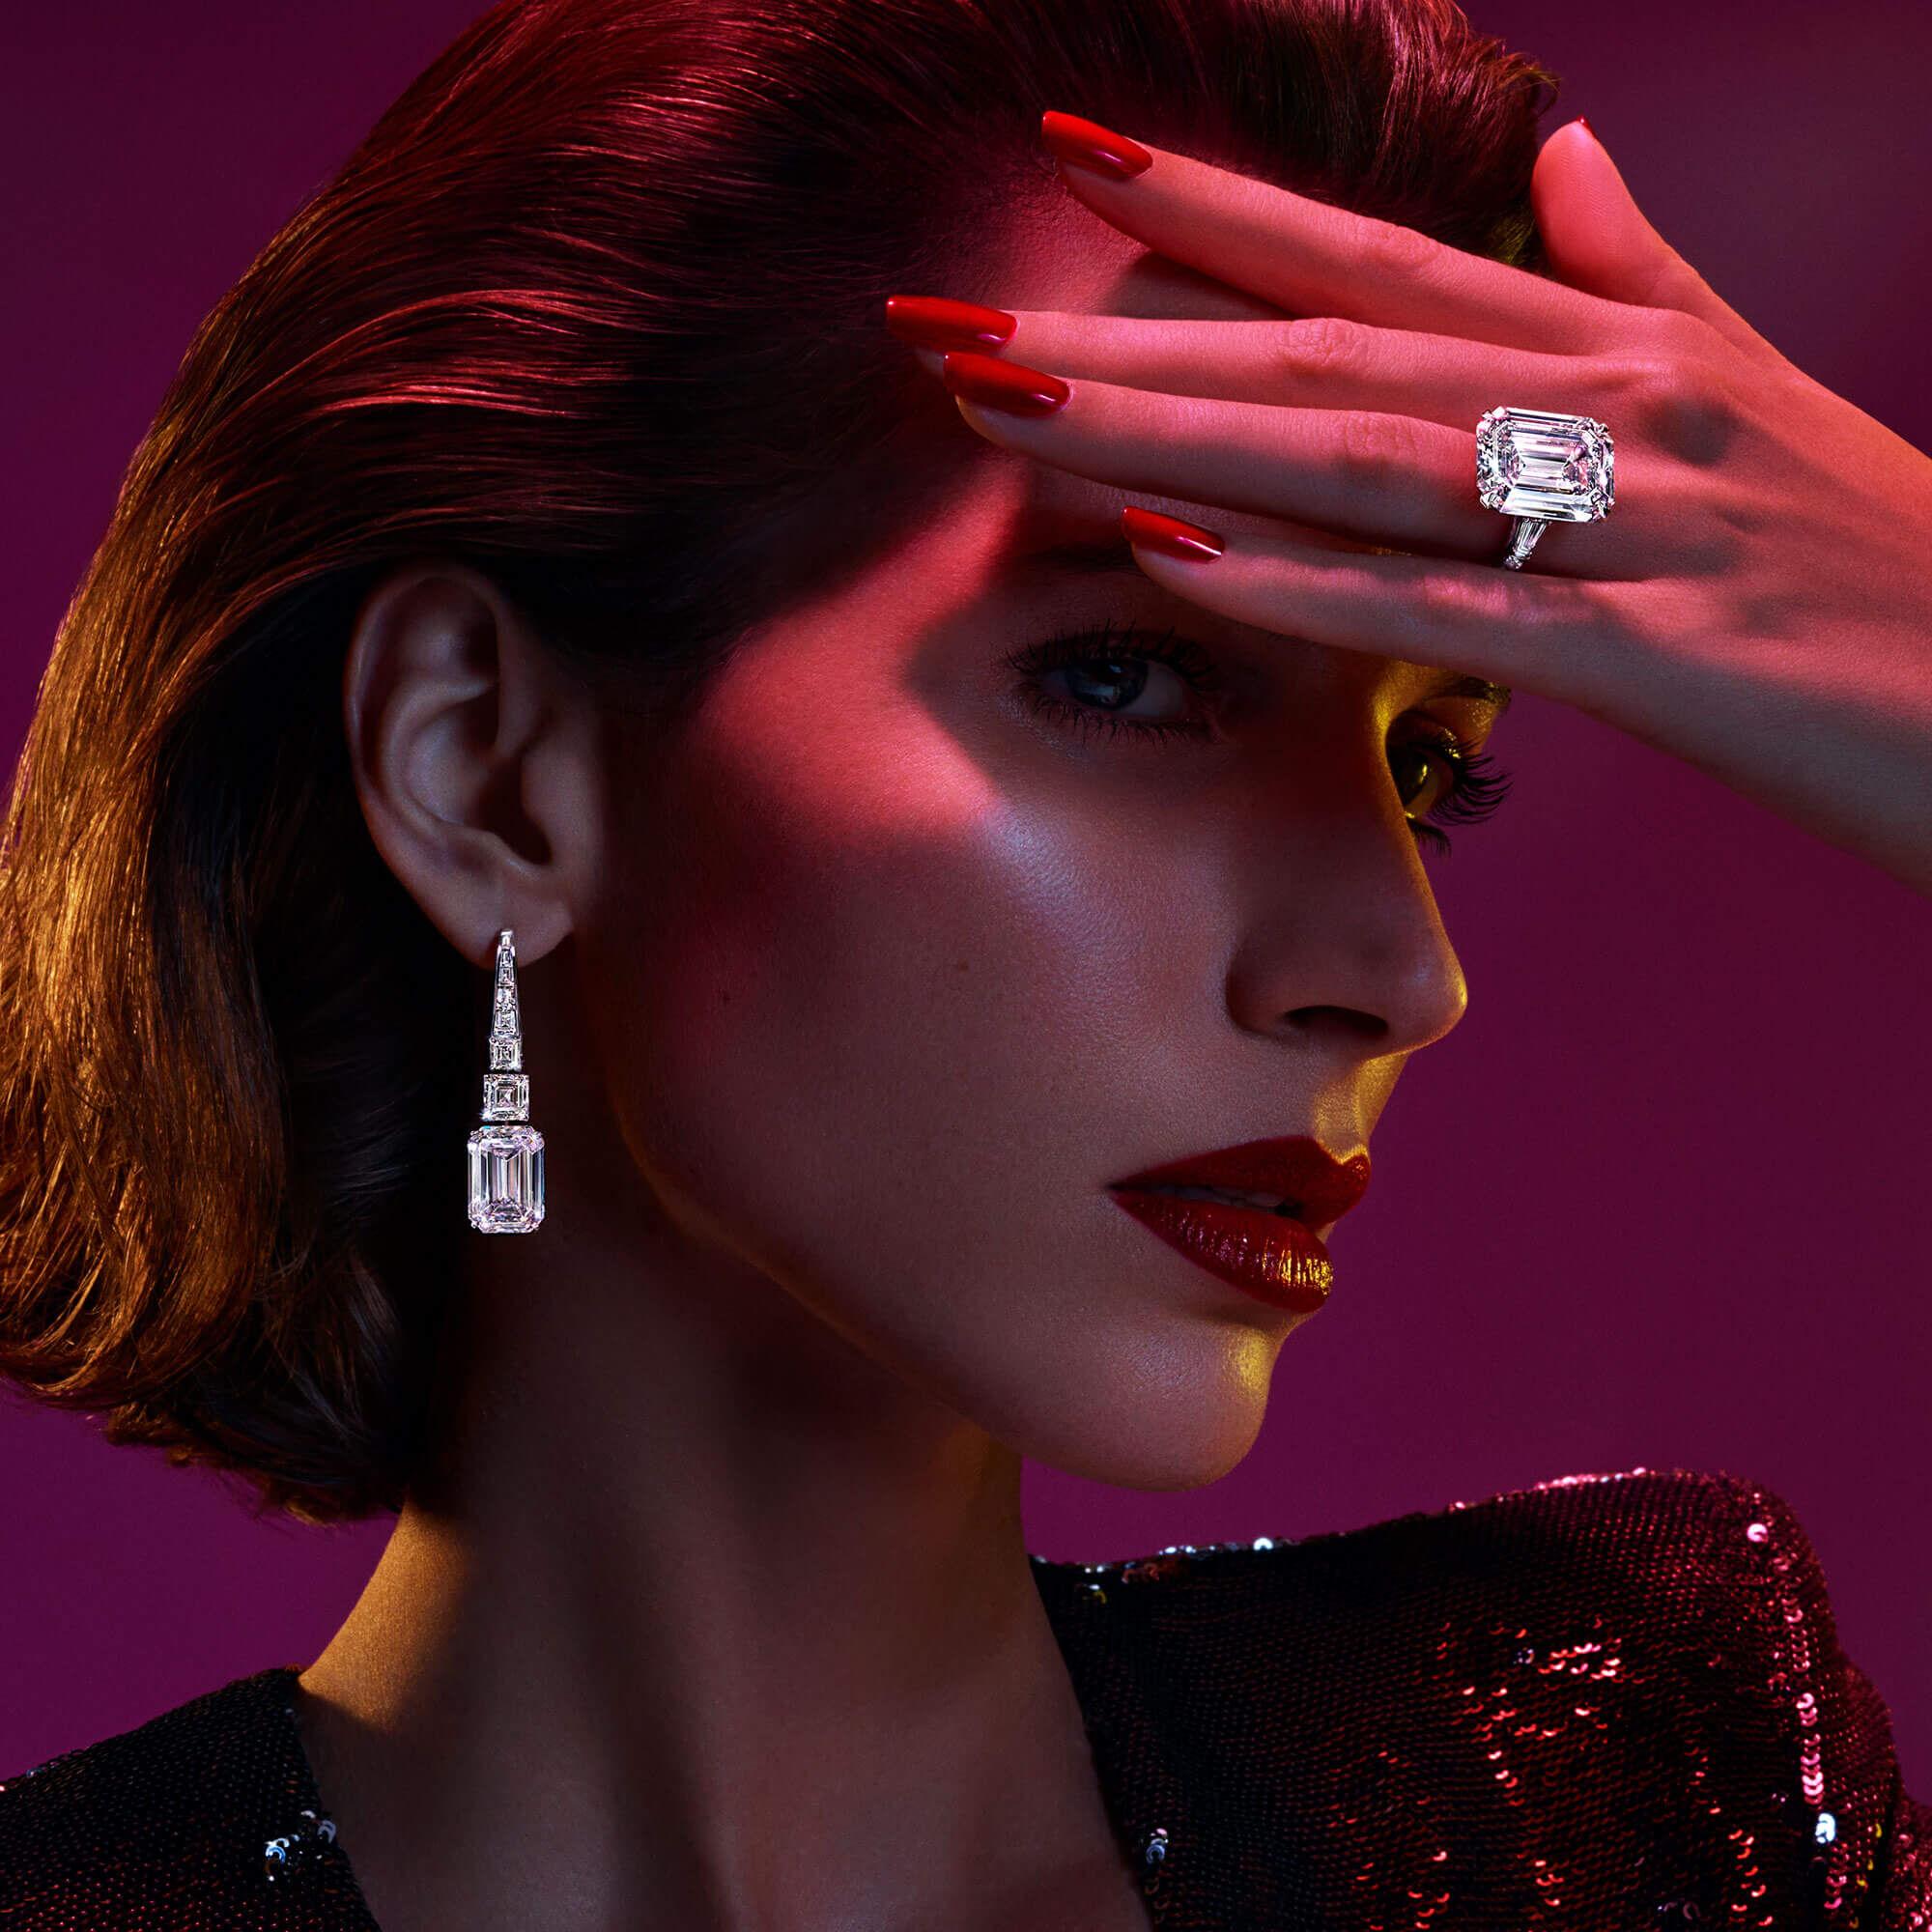 A model wears Graff high jewellery emerald cut diamond earrings and a D Flawless emerald cut diamond ring